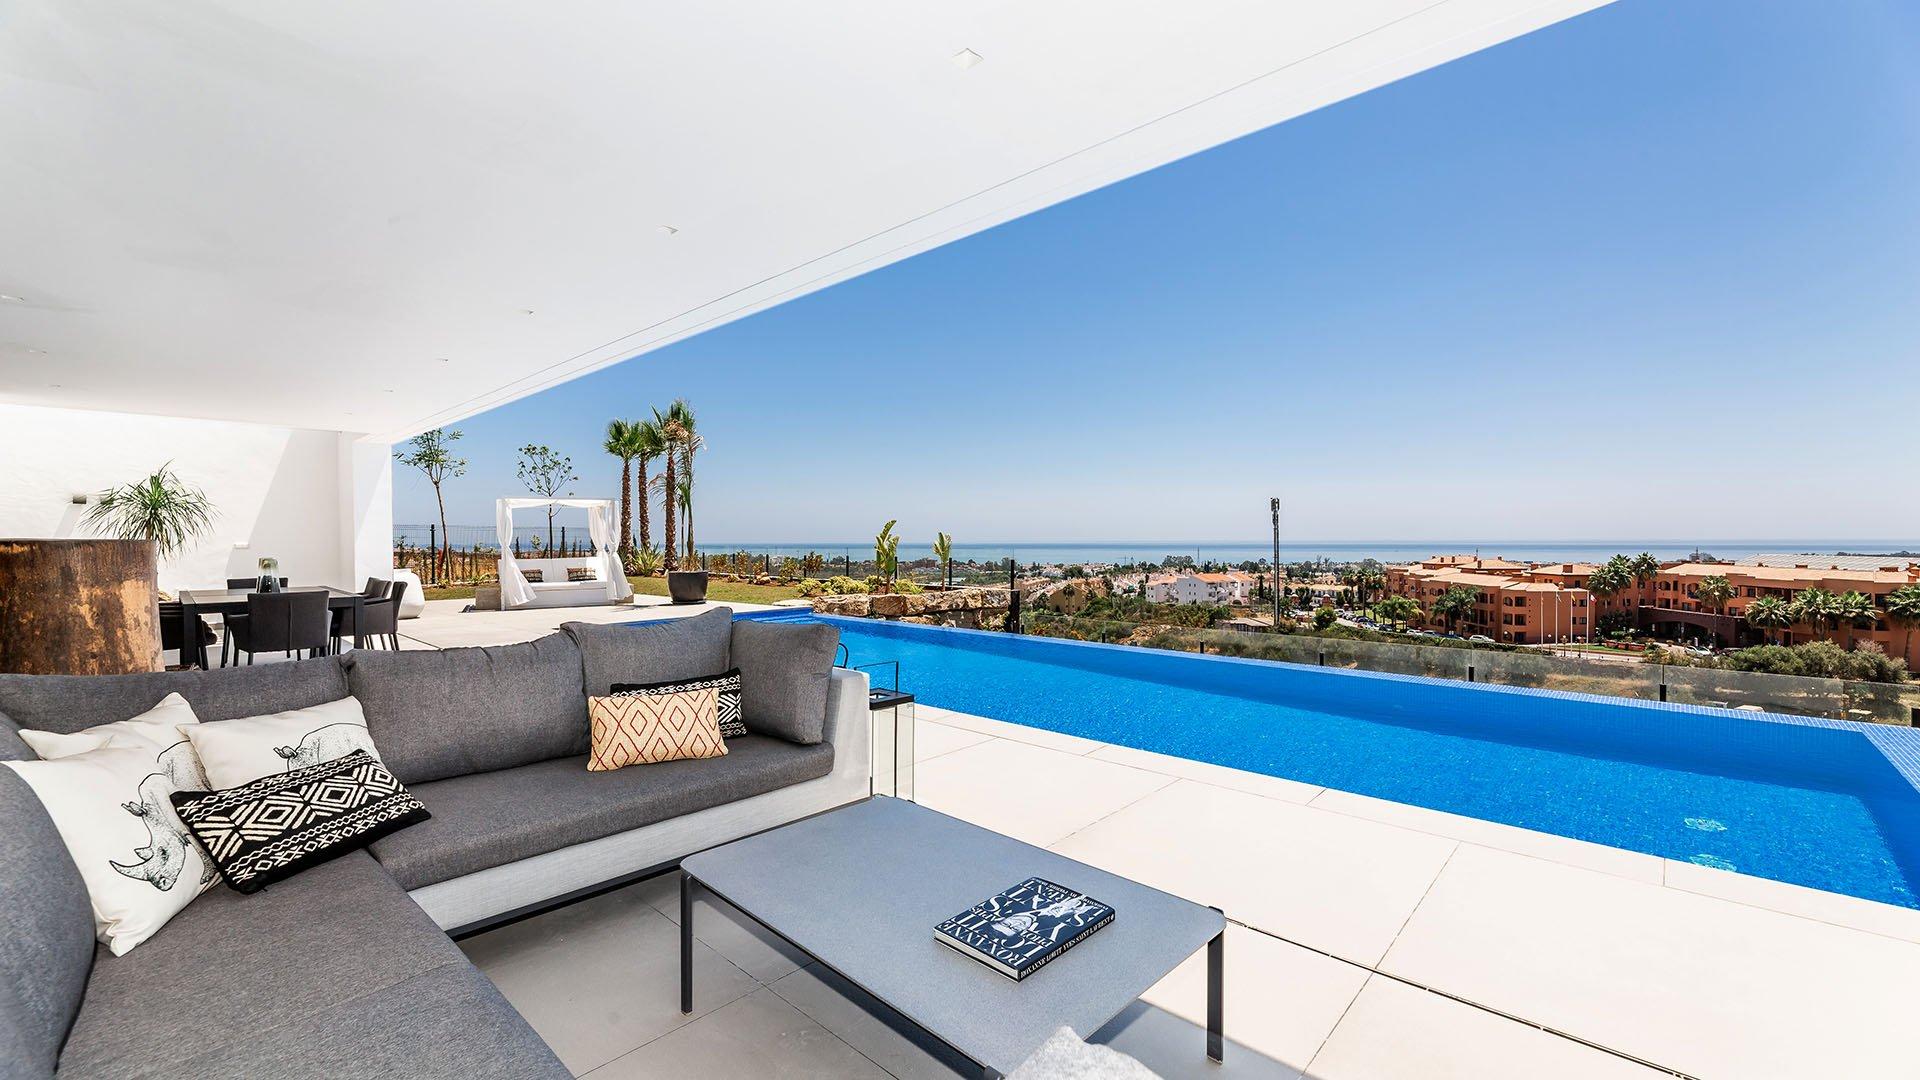 Los Flamingos Views: Contemporary villas with panoramic views located in a 5-star golf resort